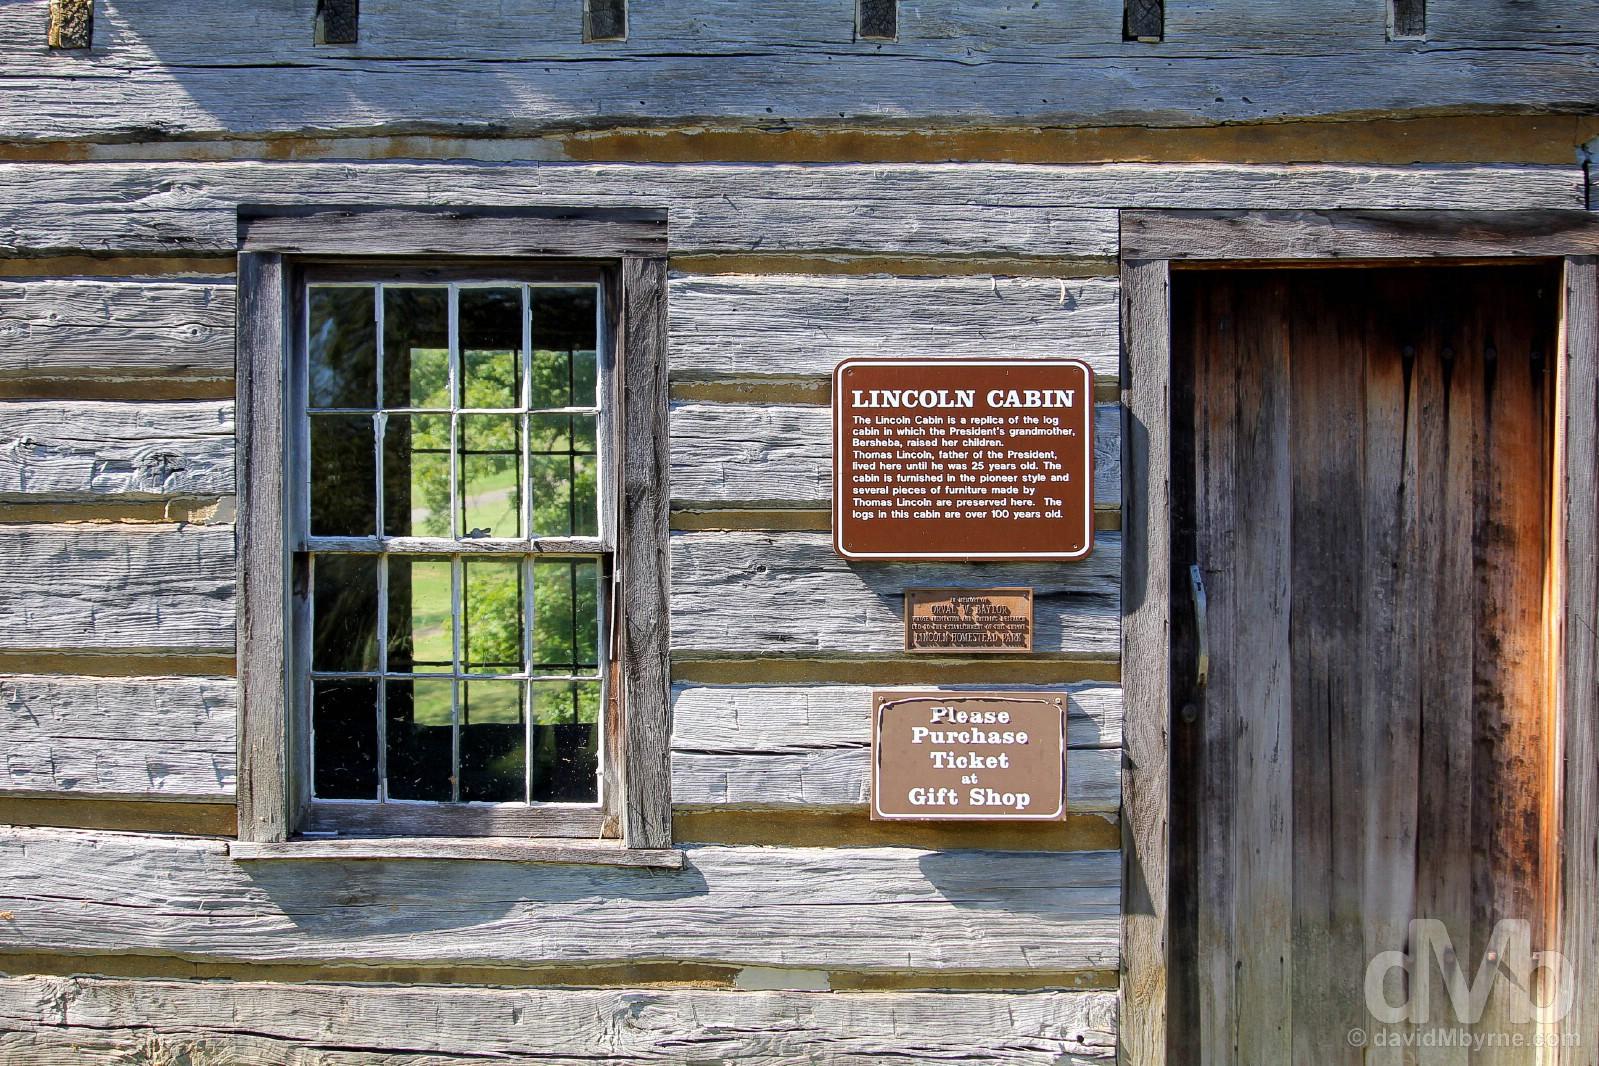 Lincoln Homestead State Park, Washington County, Kentucky, USA. September 27, 2016.